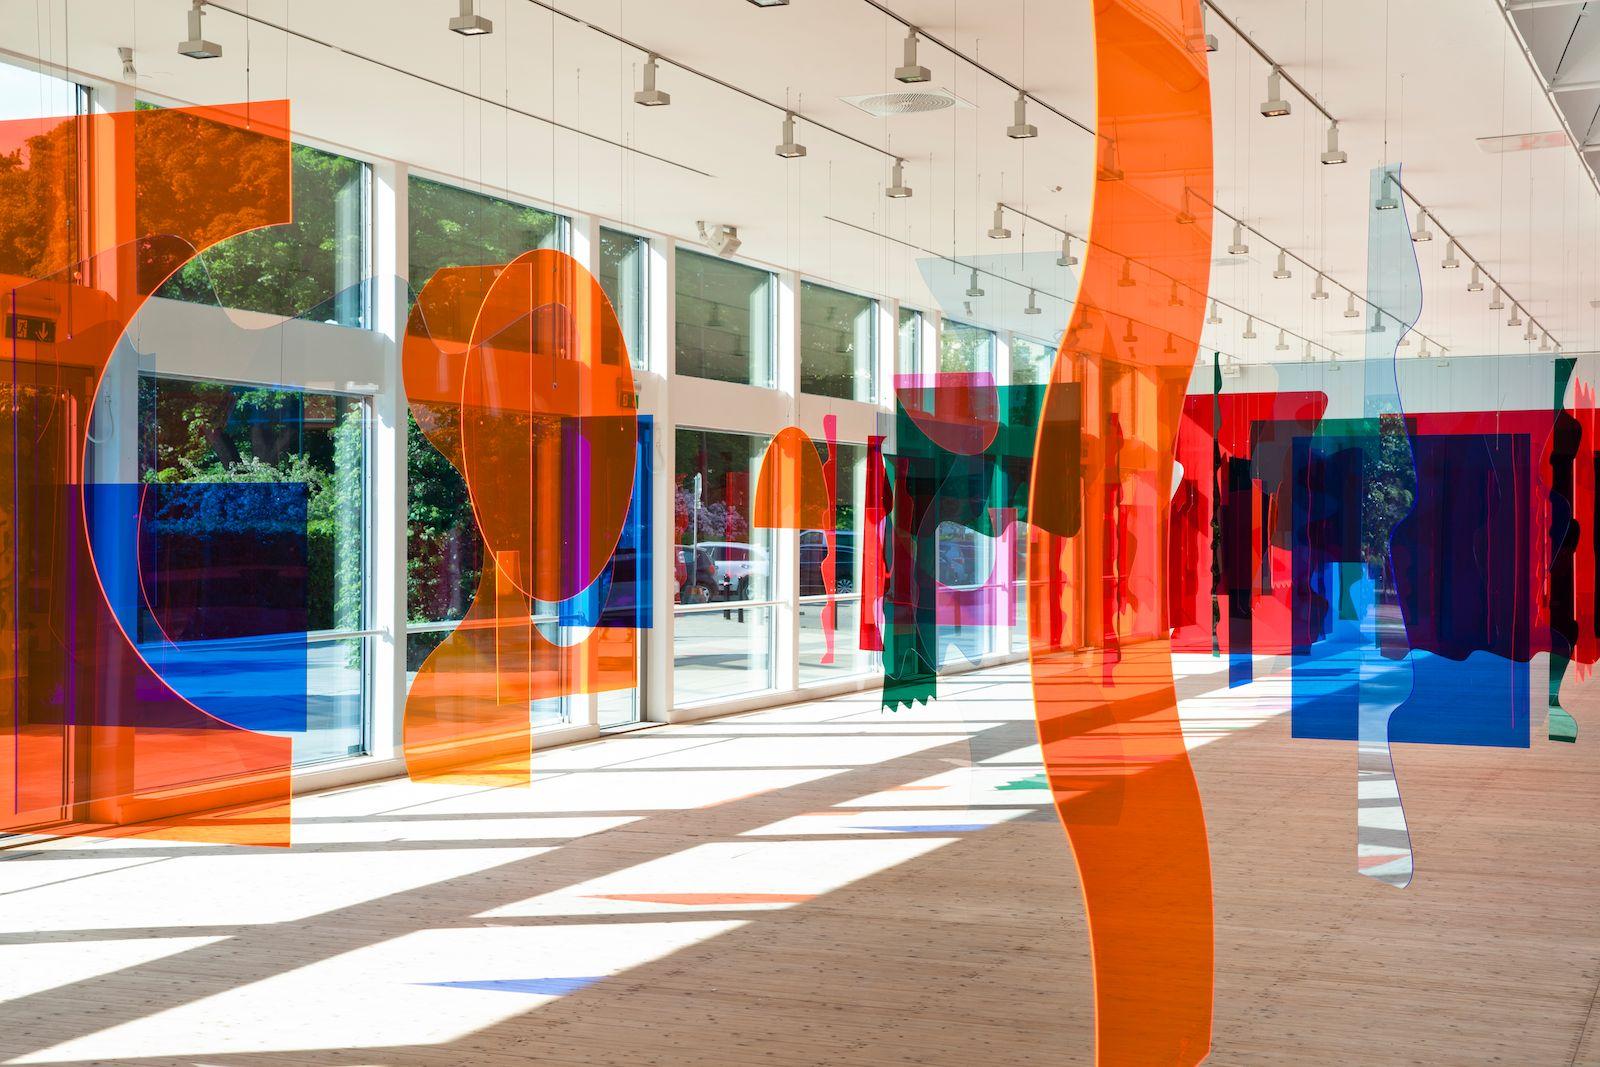 Installation view, Siri Aurdal 'Continuum', Malmö Konsthall, Malmö, Sweden 2018